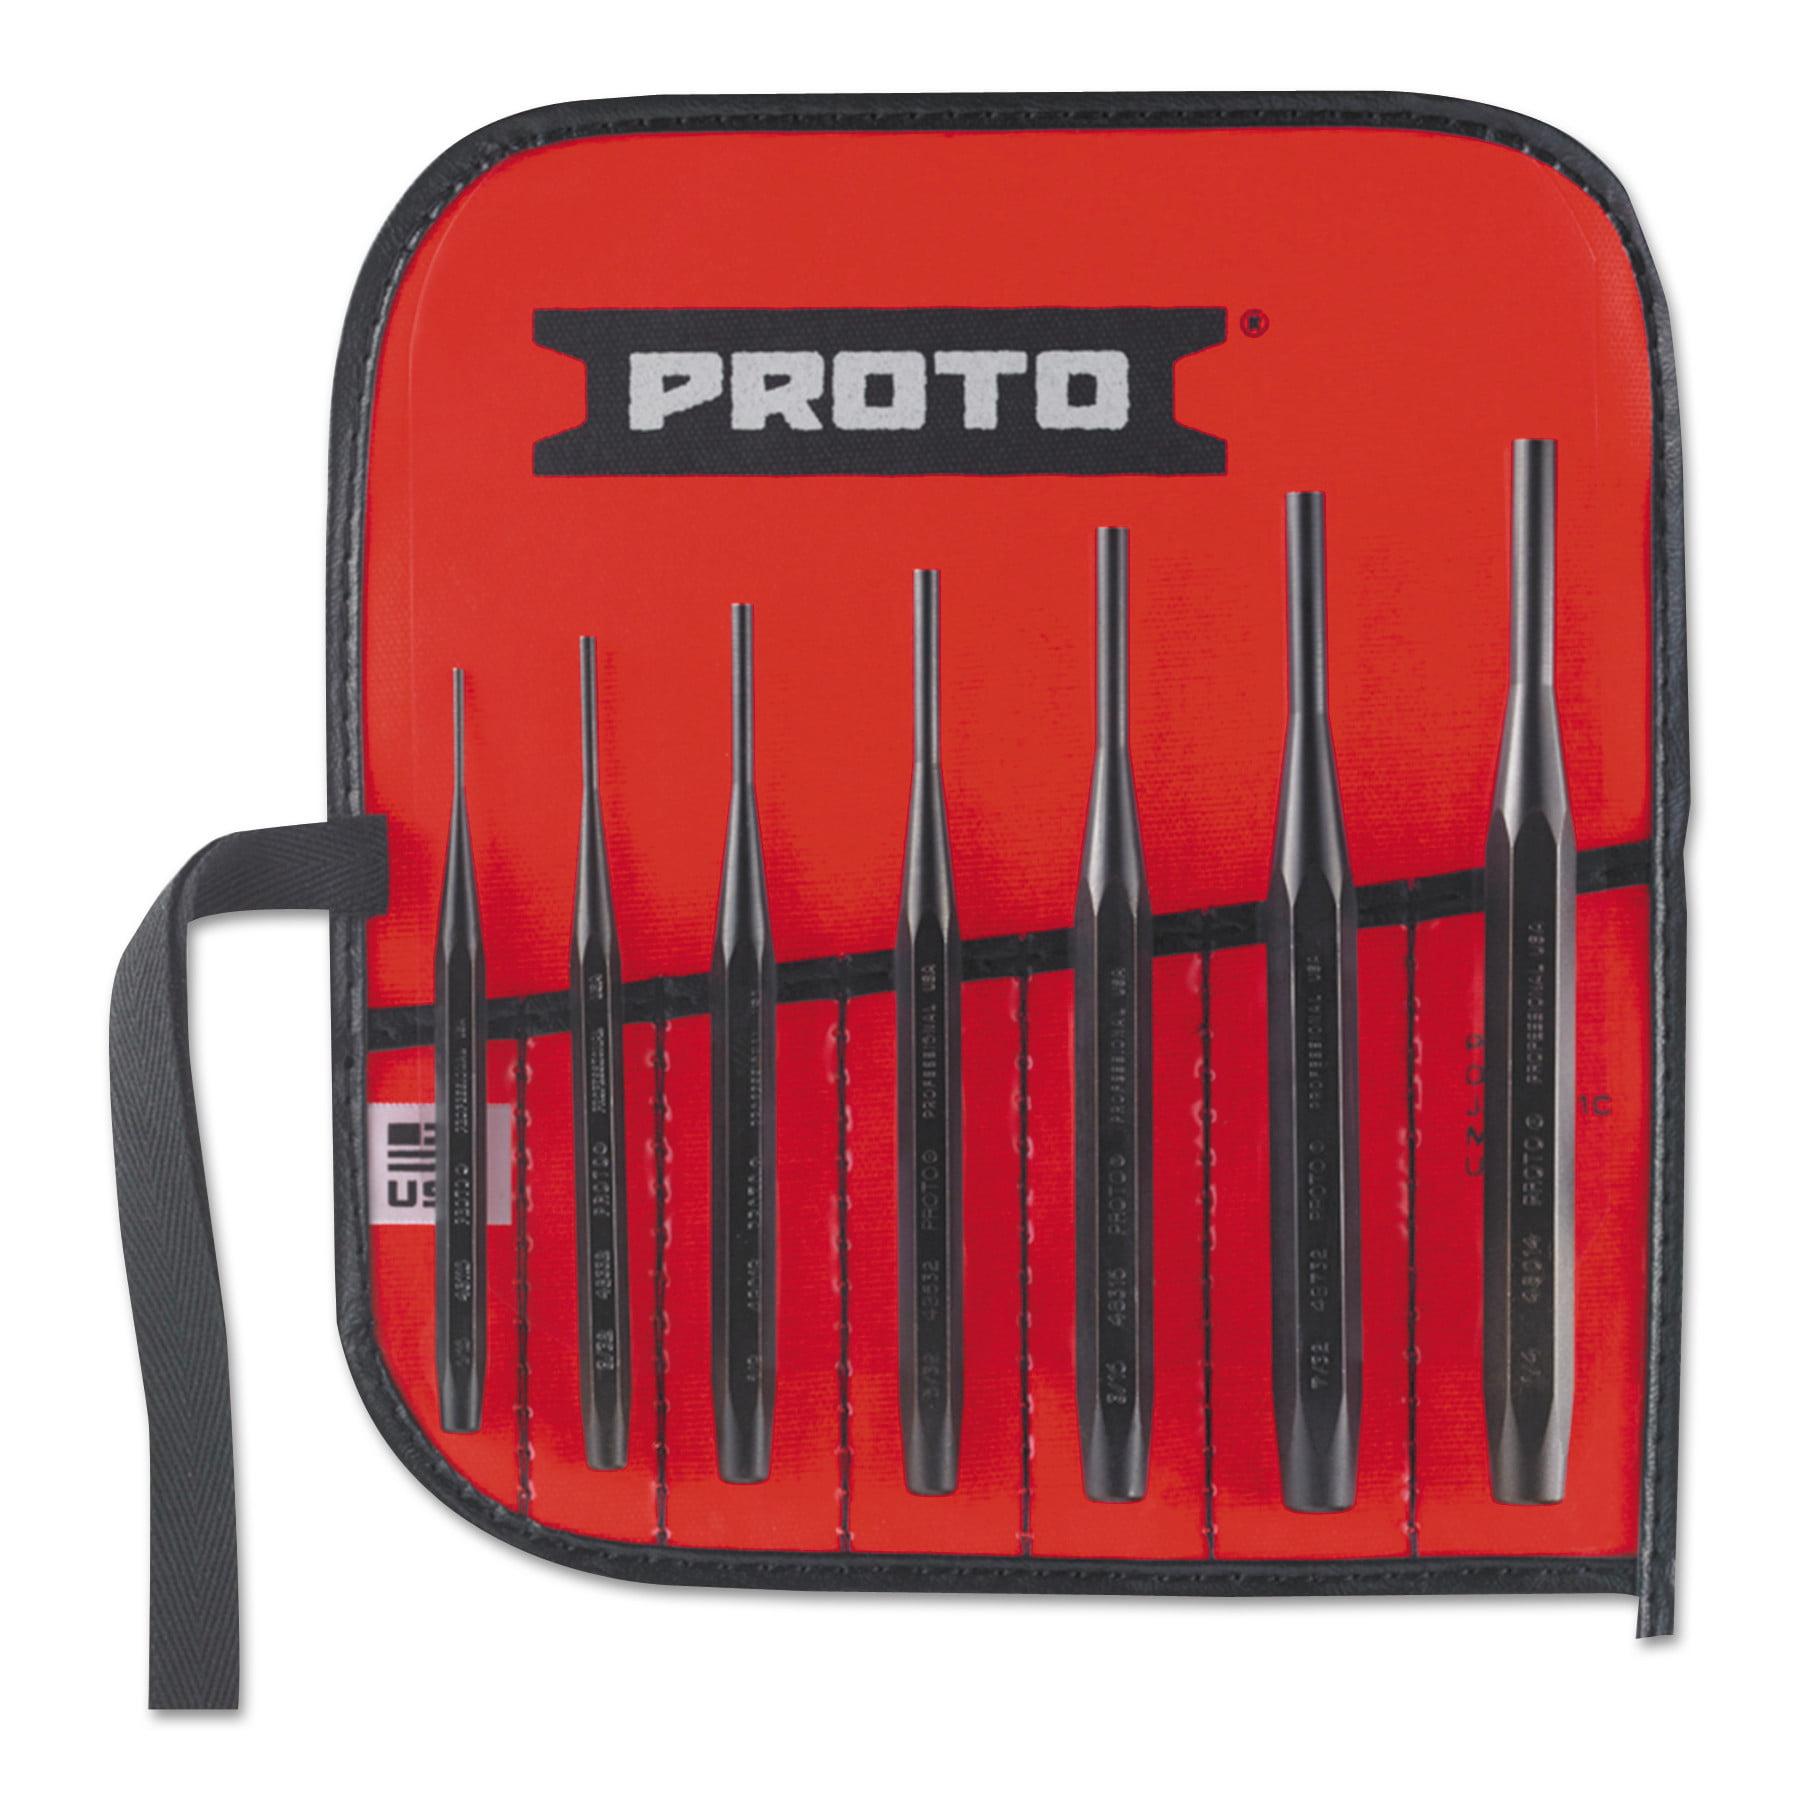 Proto 7 Pc. Super-Duty Drive Pin Punch Sets, Flat, English, Kit Pouch